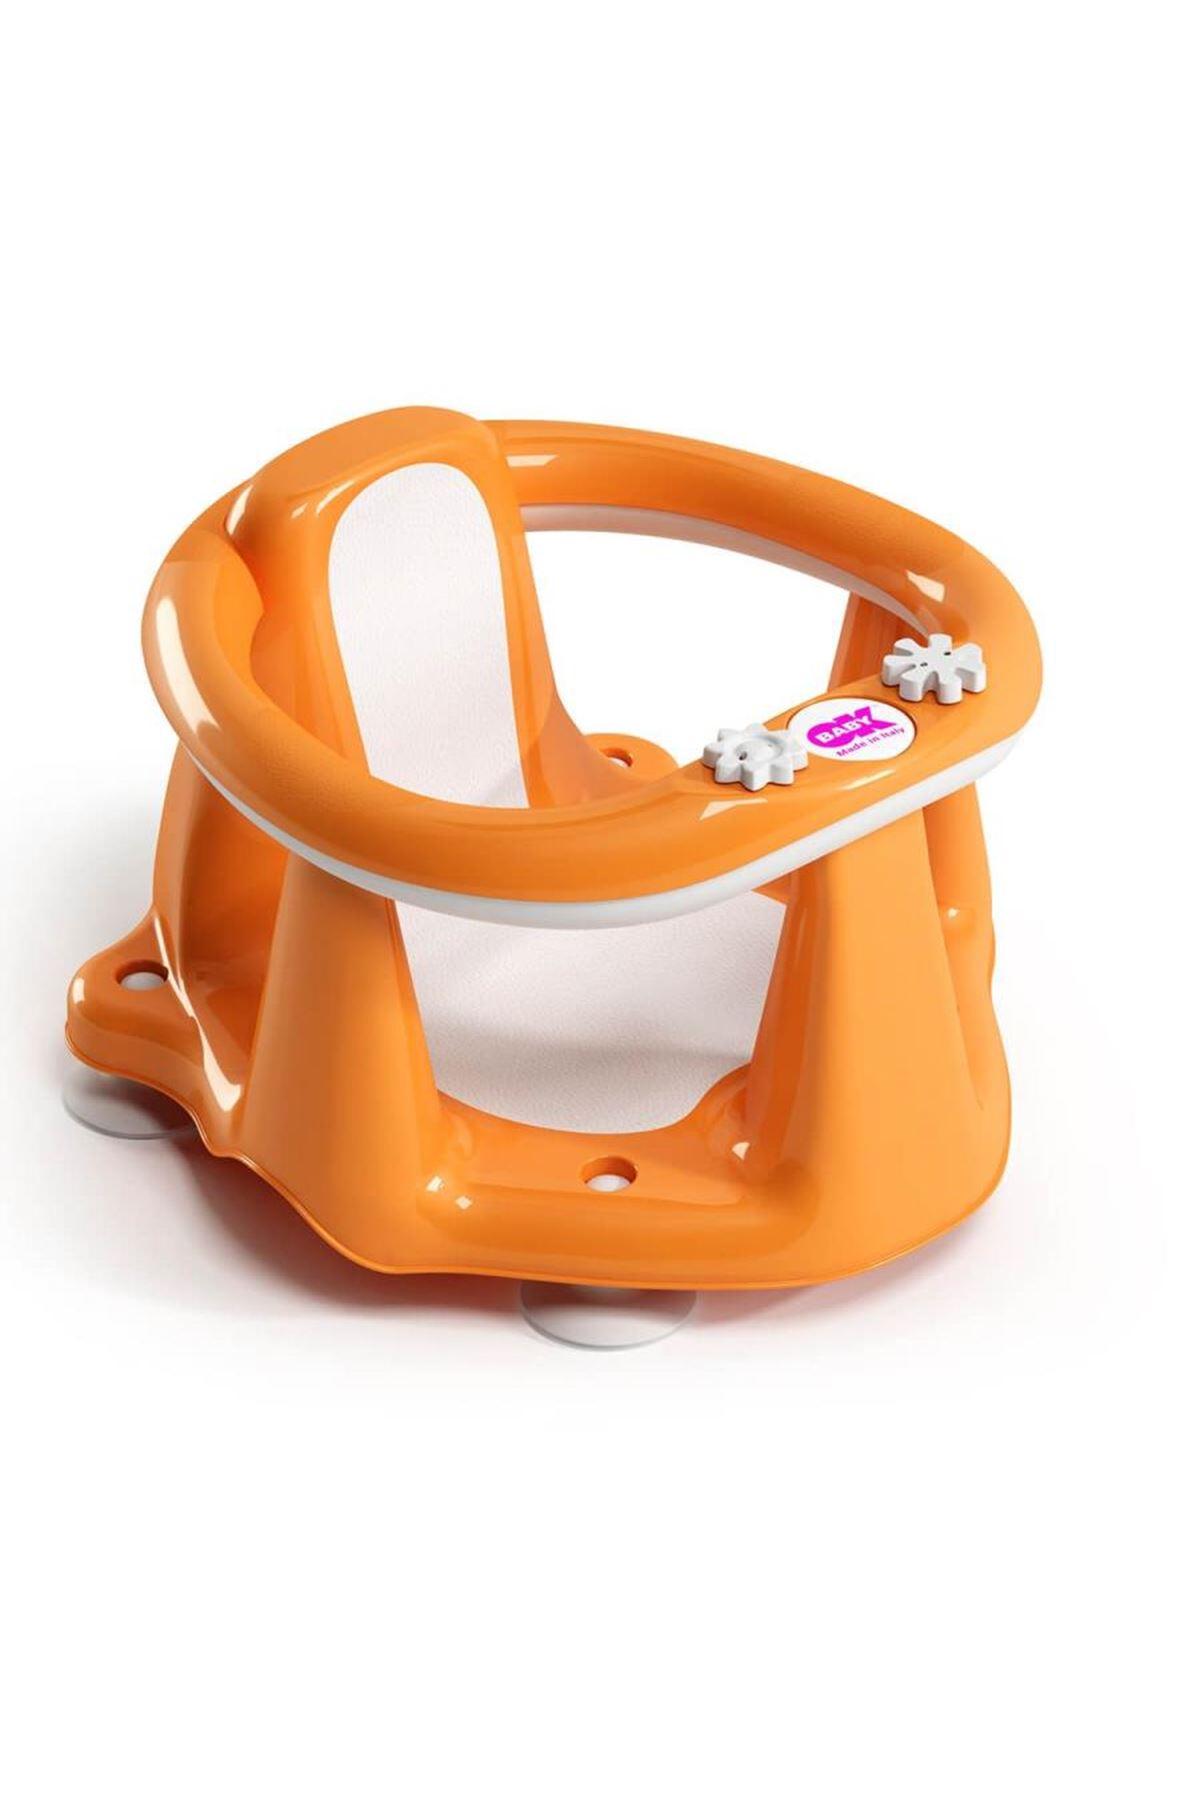 OkBaby Flipper Evol Banyo Oturağı & Hippo Banyo Siperliği / Turuncu